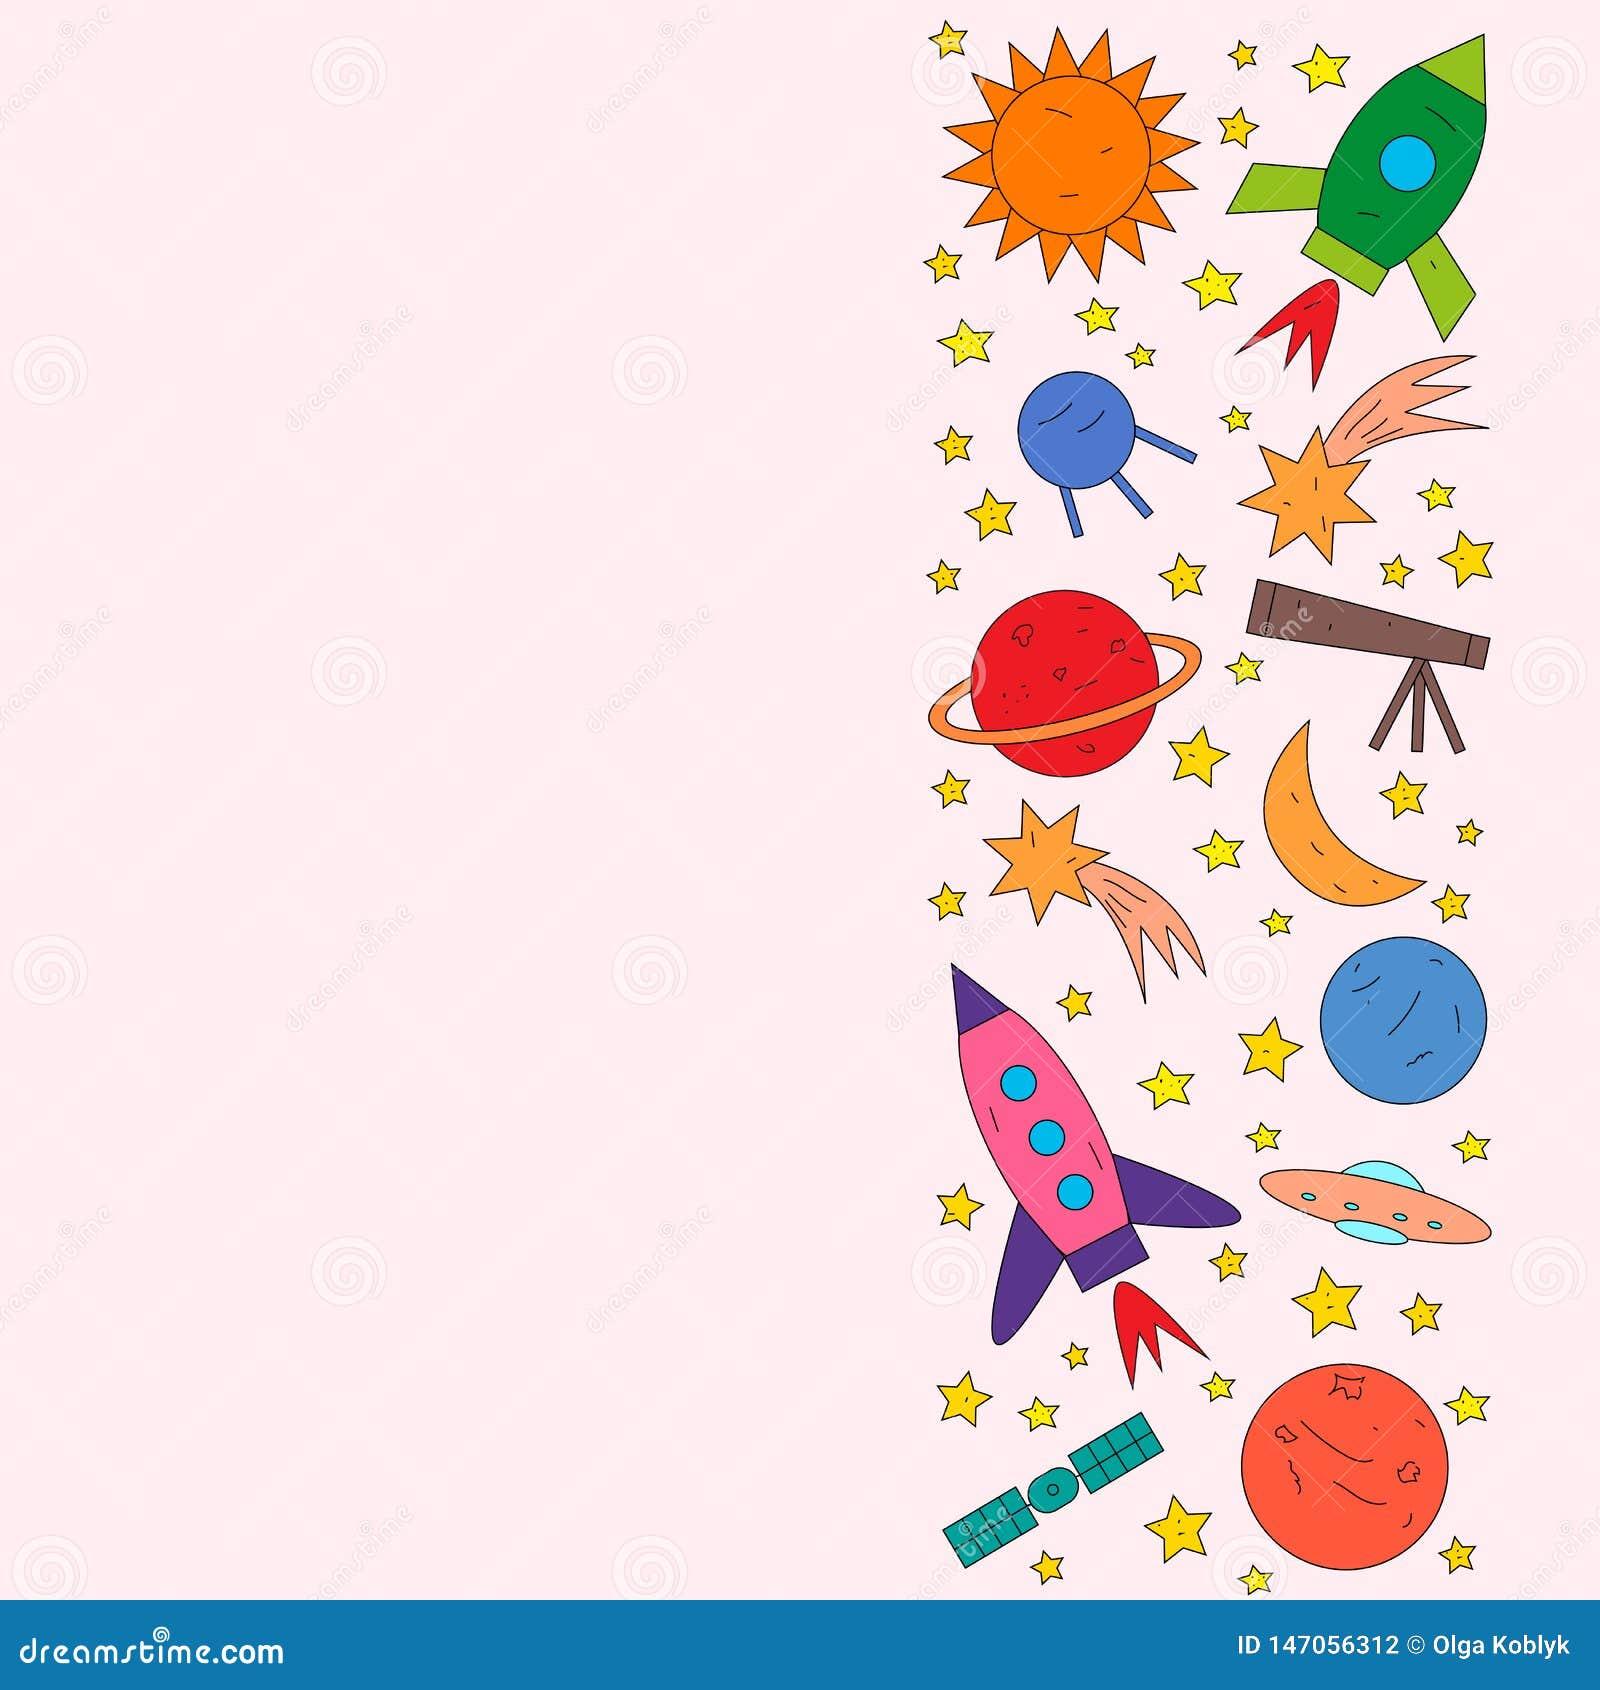 Space objects rocket, planet, star, comet, ufo, satellite